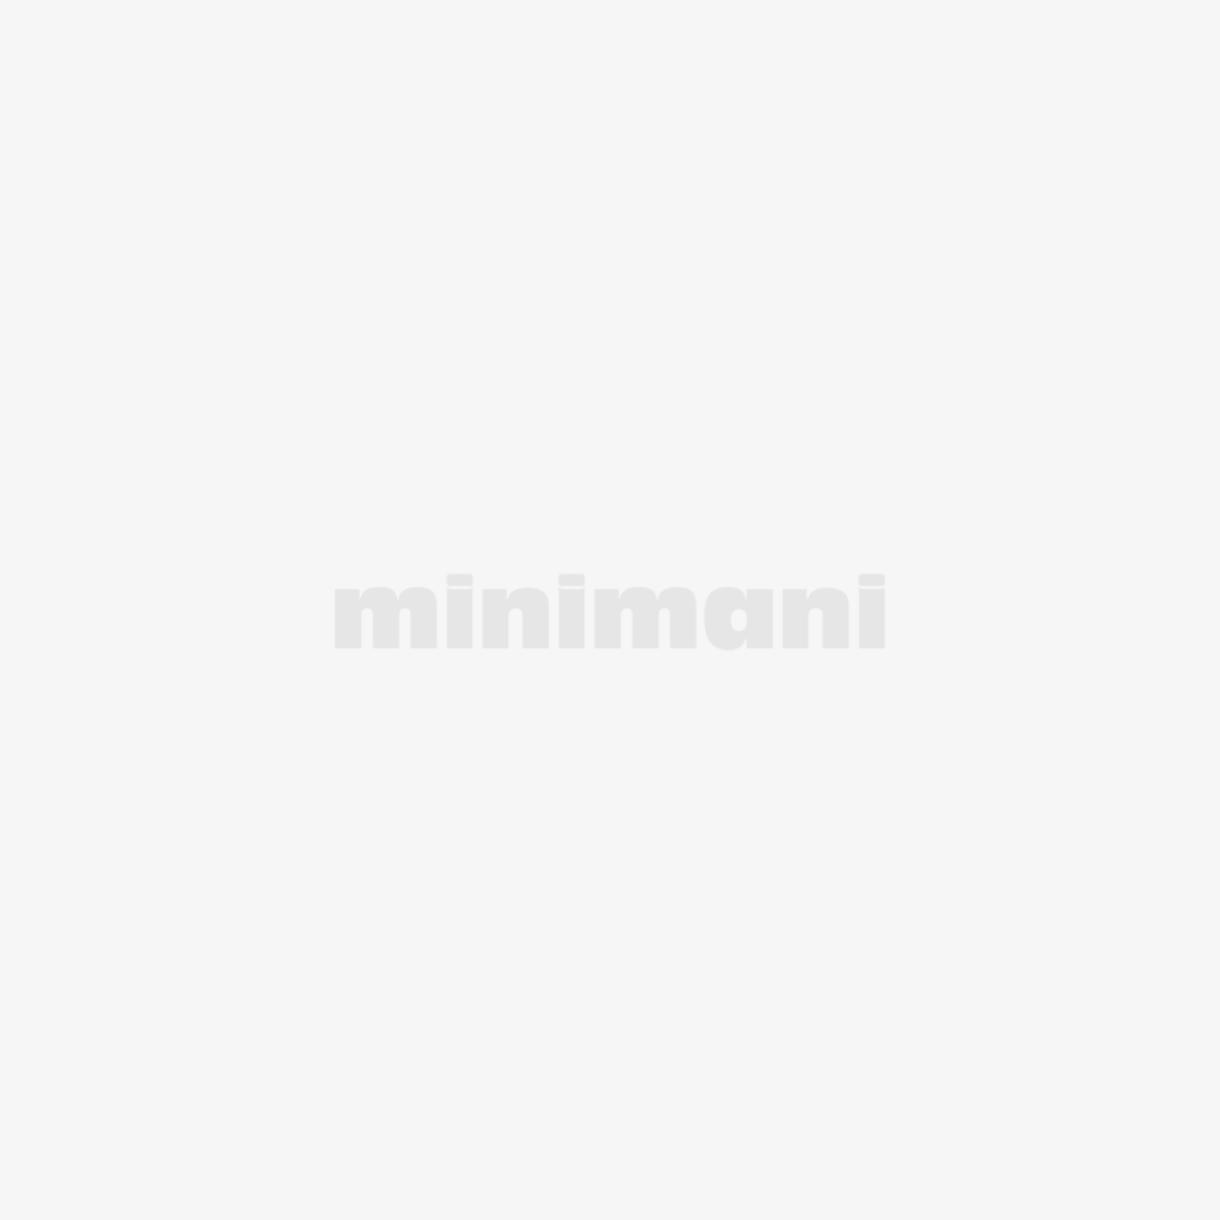 Vallila muovitabletti 37x37 cm, Amos